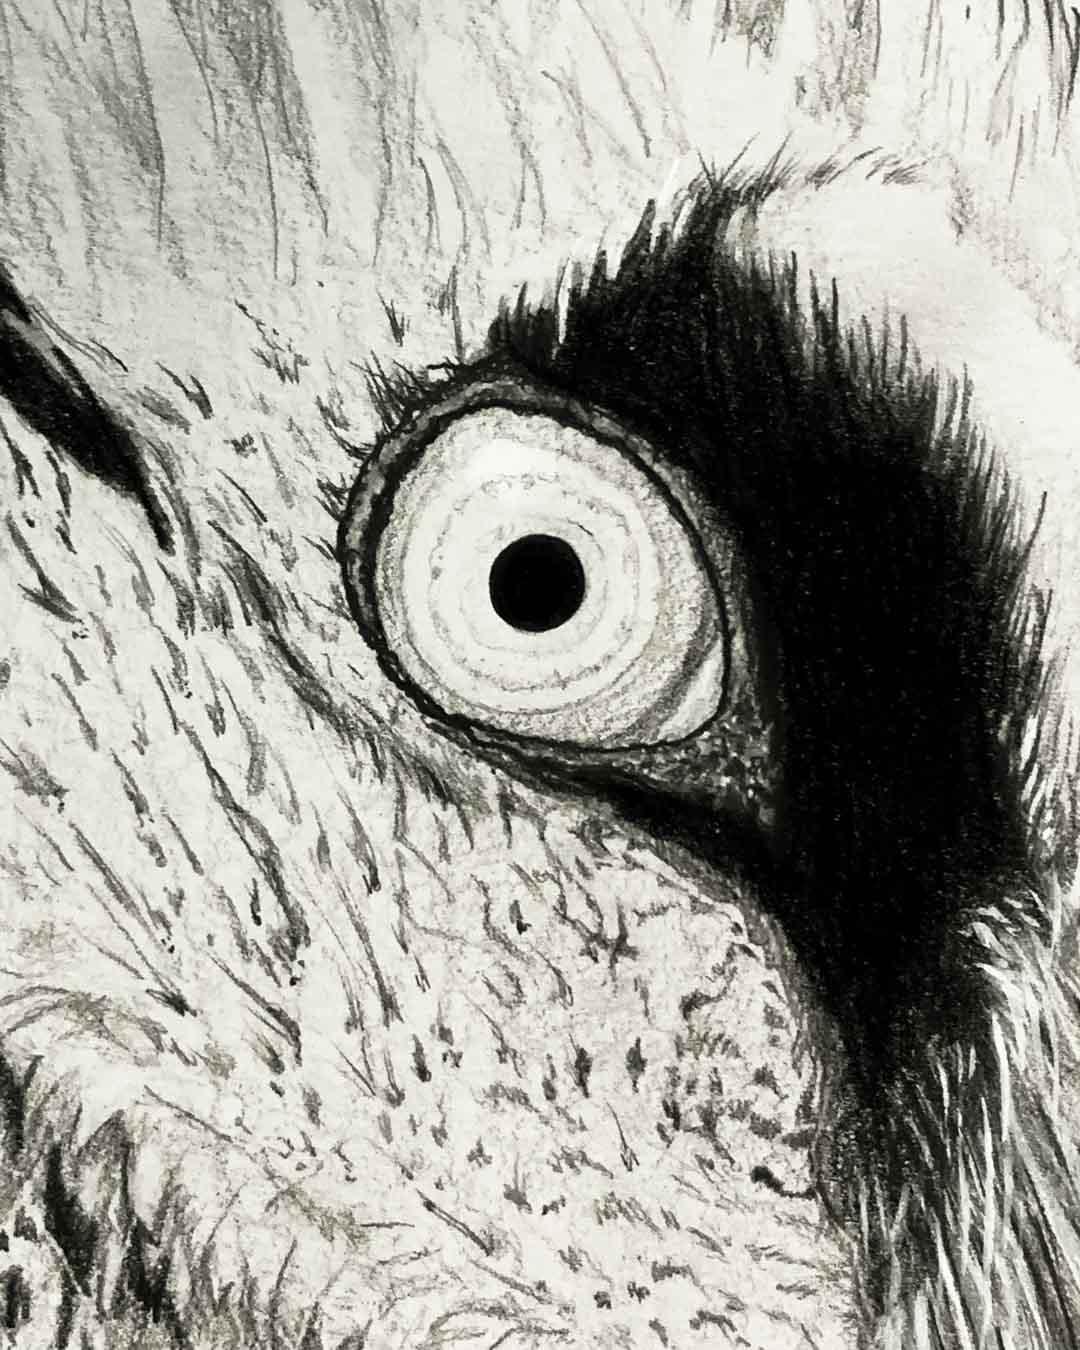 Lammergeier Zwei Eye Detail